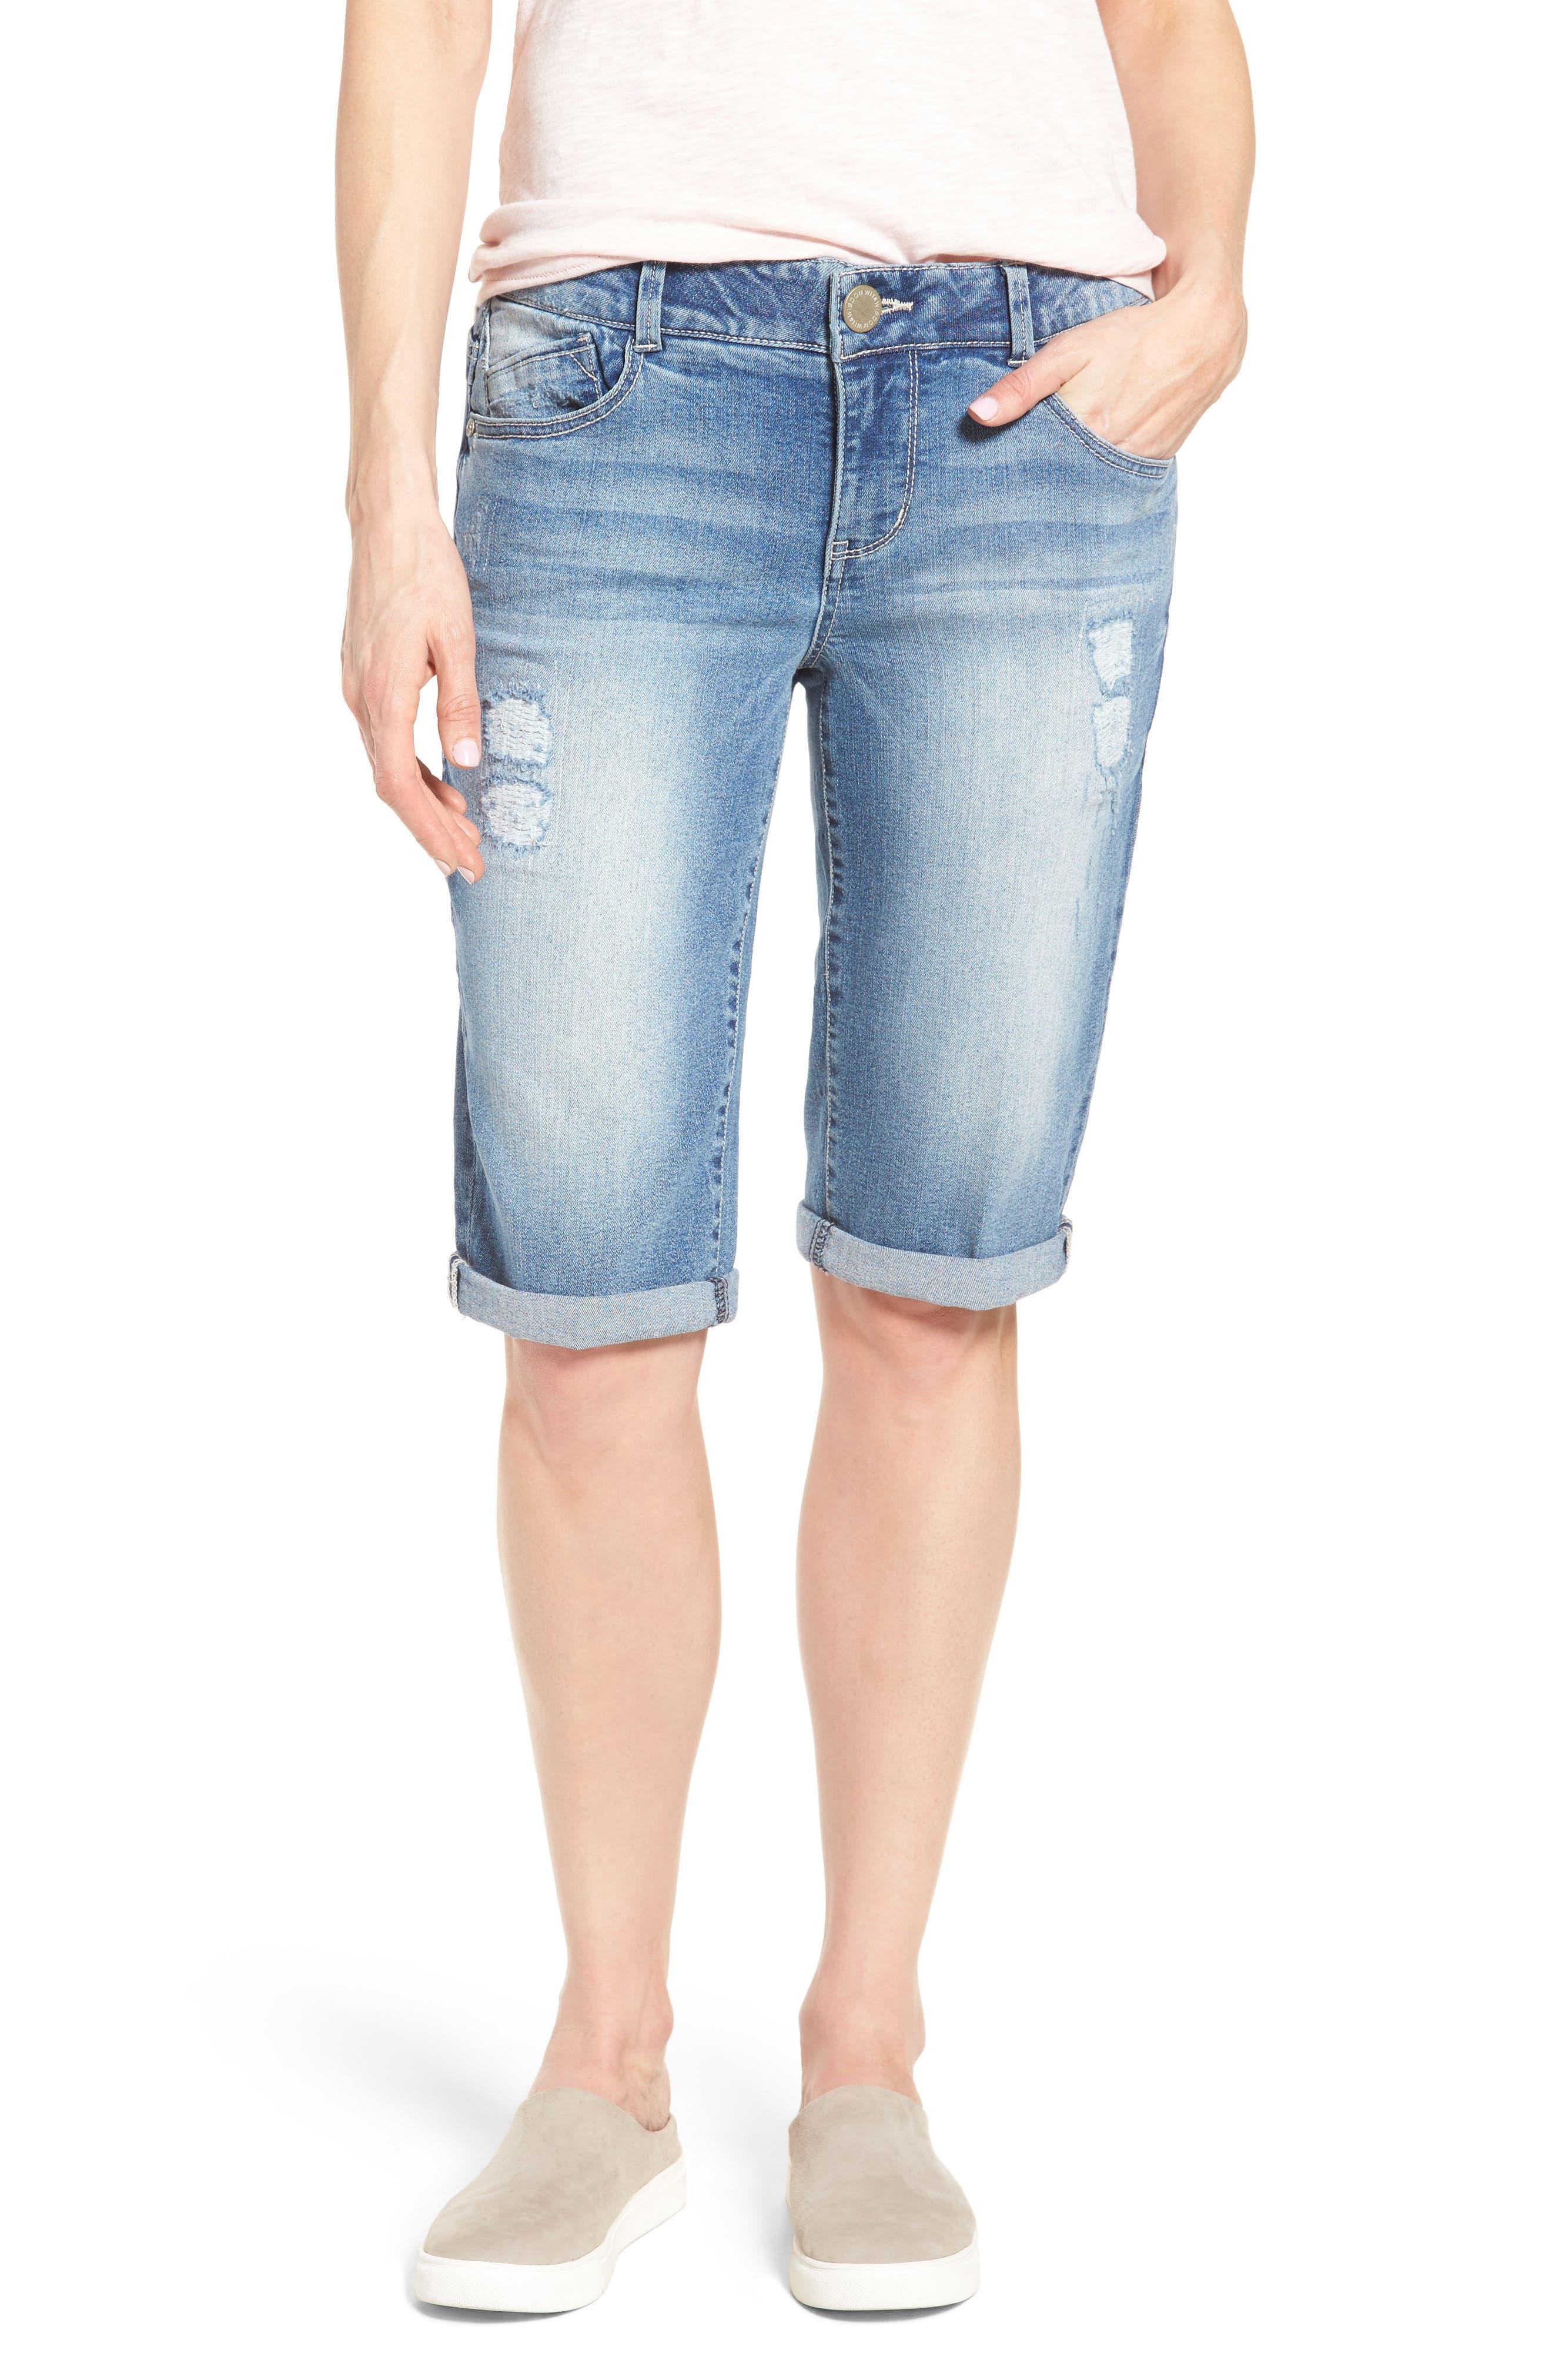 Ab-solution Ripped Denim Bermuda Shorts,                         Main,                         color, Light Blue